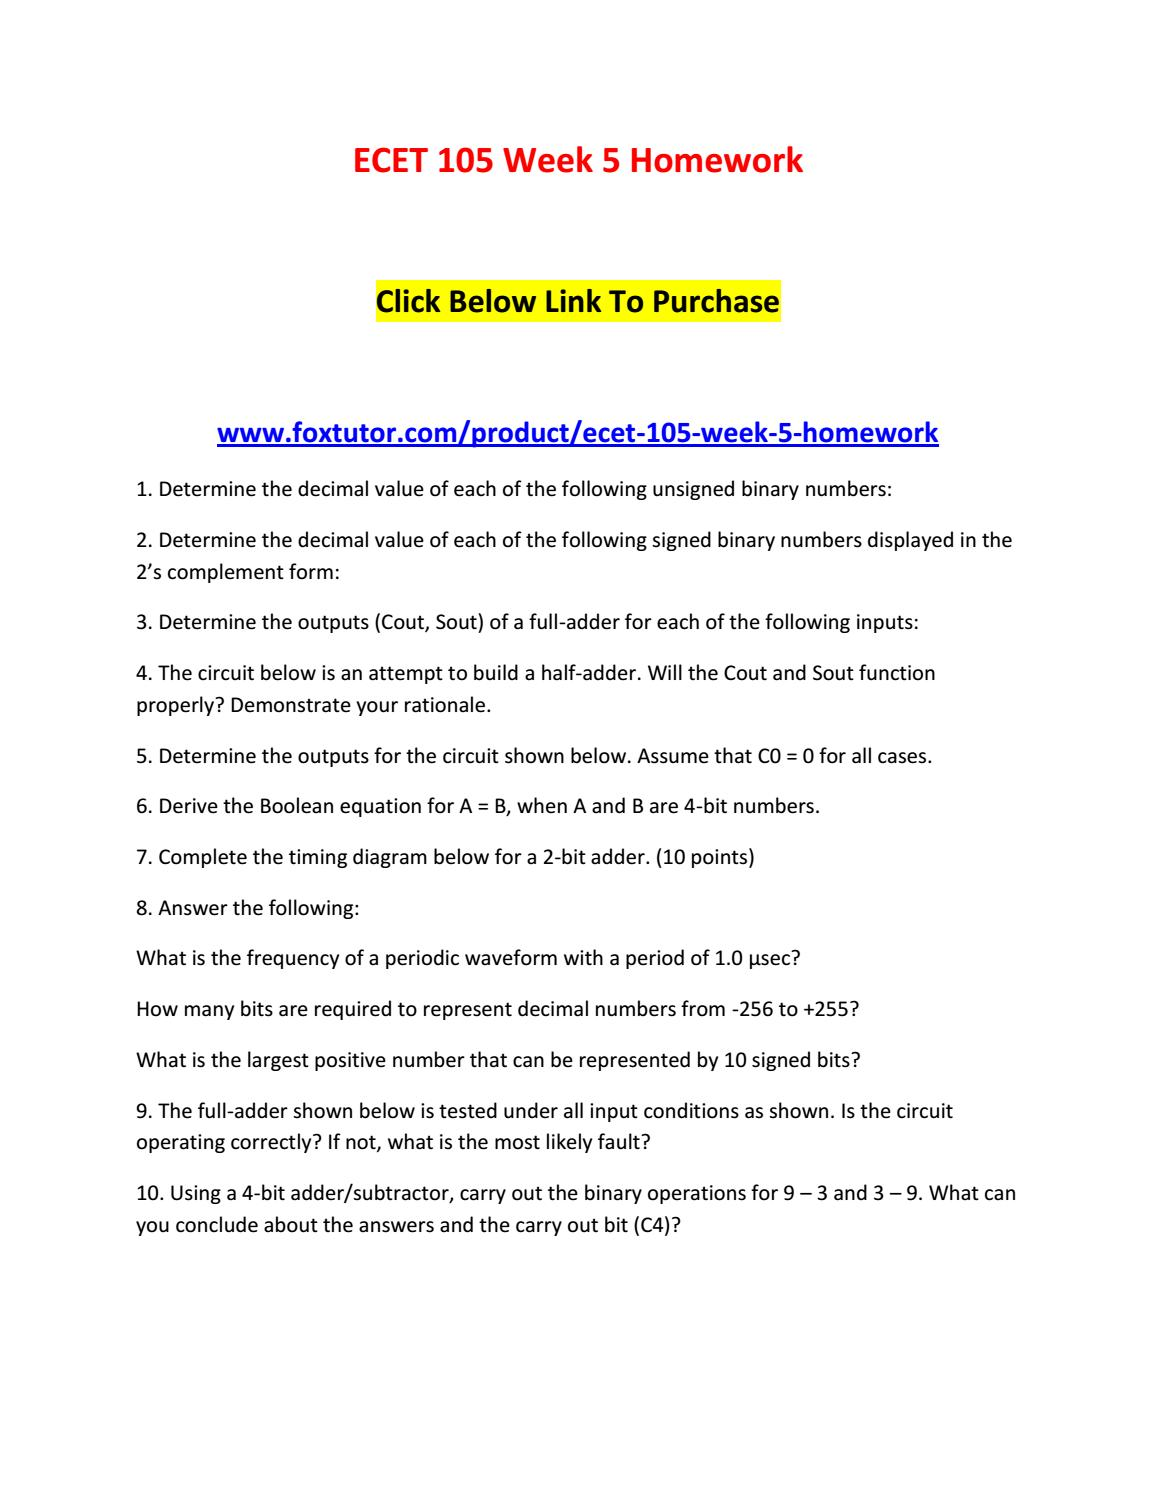 Ecet 105 Week 5 Homework By Ecet105ft Issuu 1 S Complement Circuit Diagram